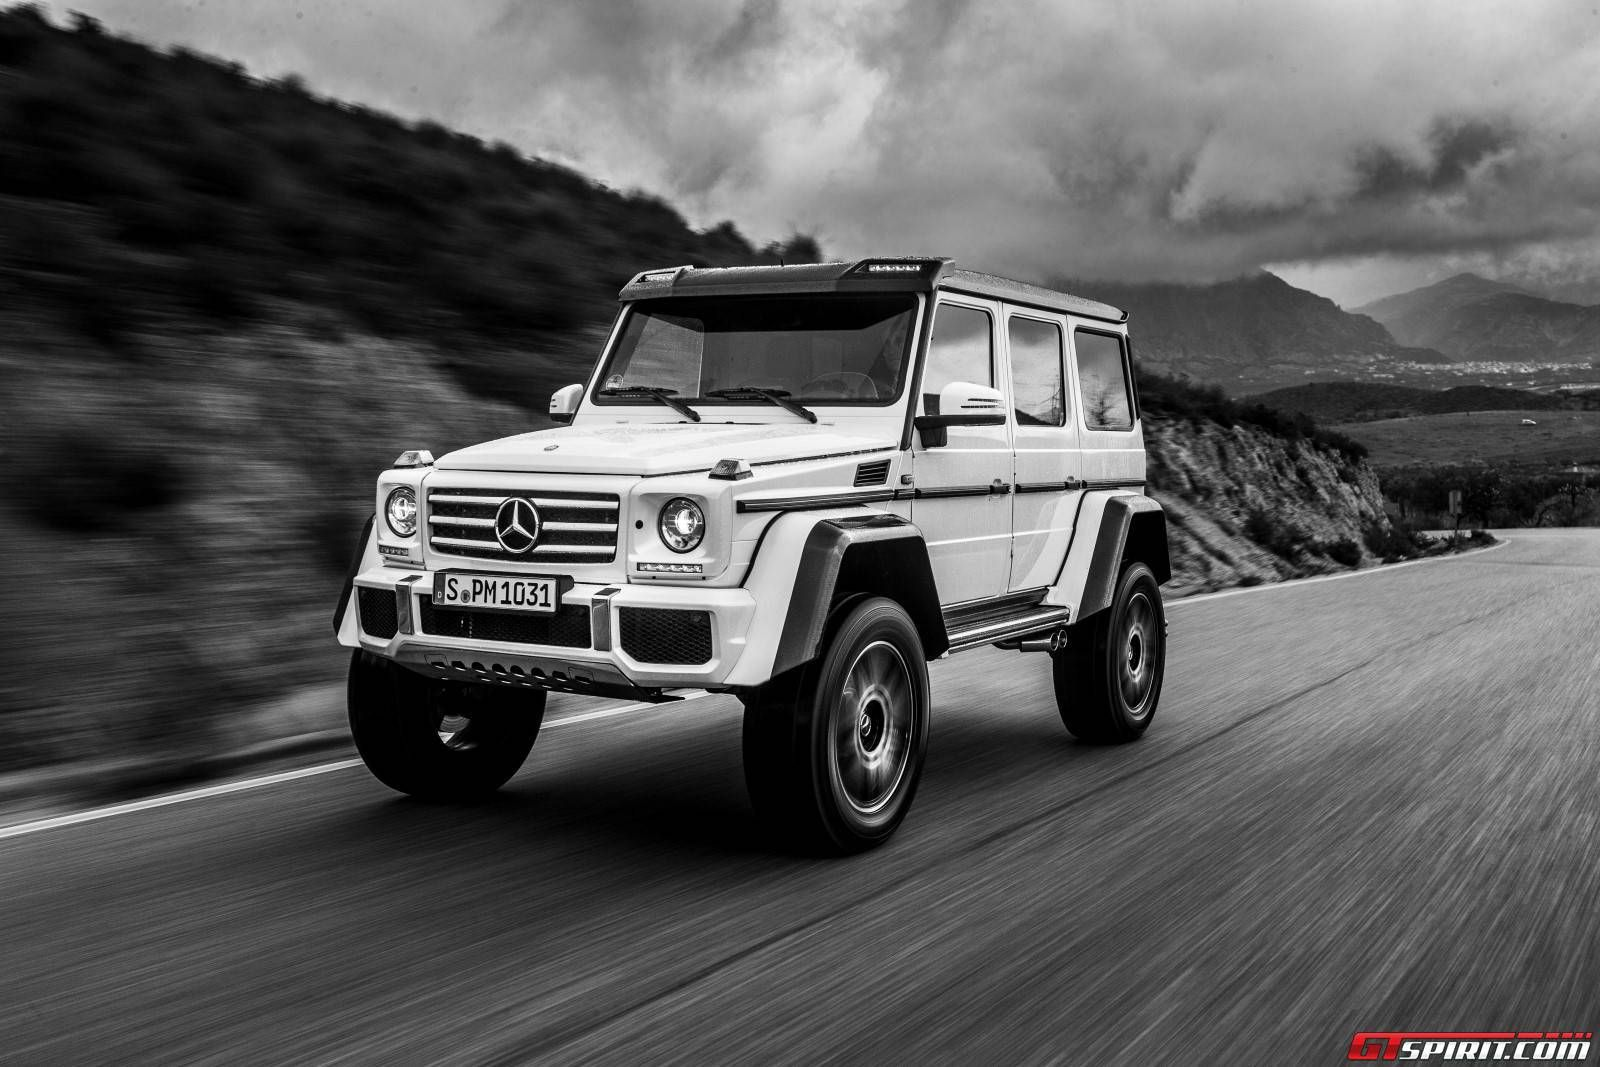 Mercedes Benz 4x4 : mercedes benz g 500 4x4 white cars ~ Maxctalentgroup.com Avis de Voitures